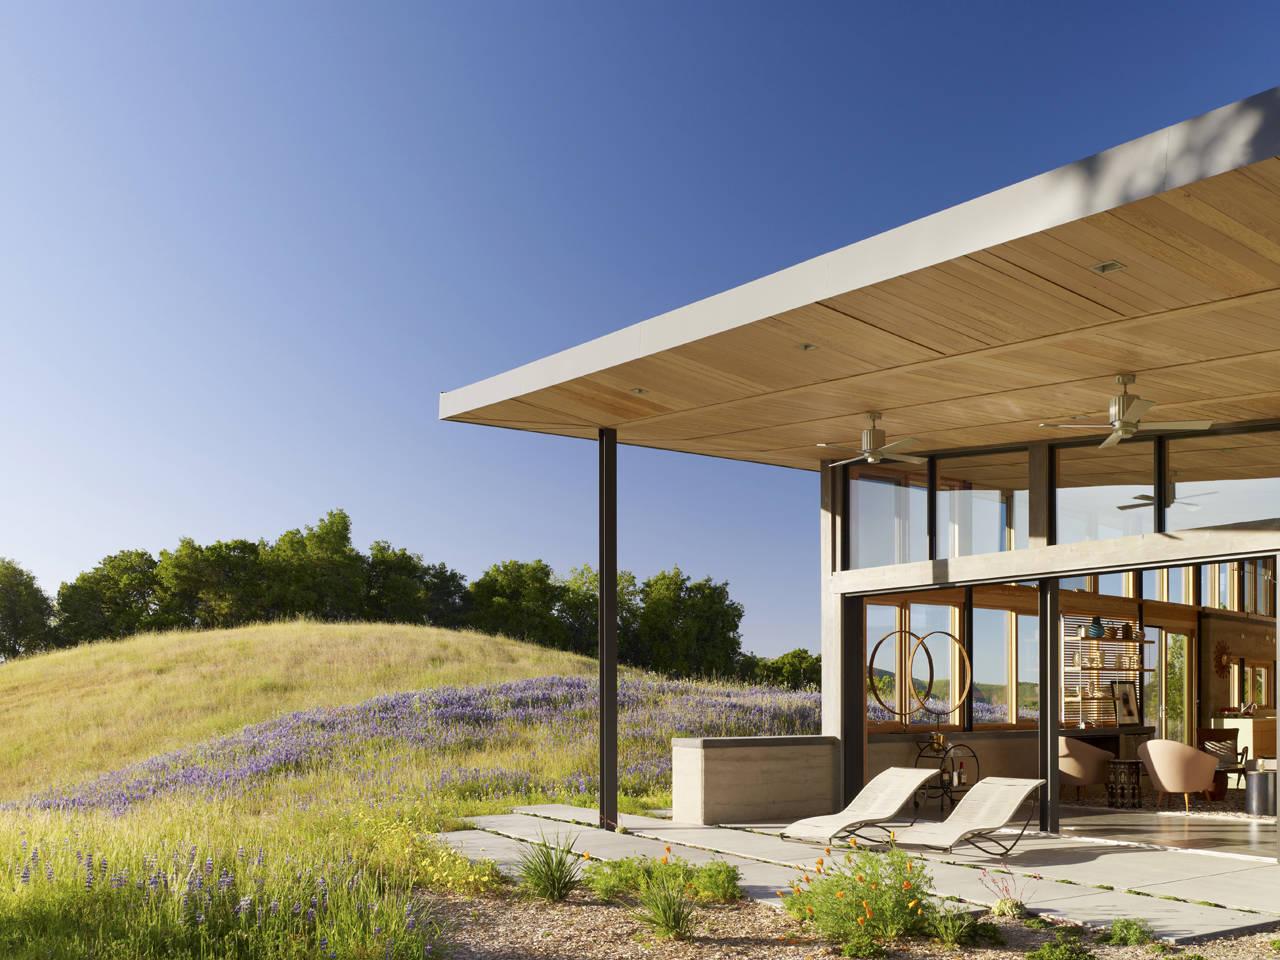 Terrace Views, Caterpillar House in Carmel, California by Feldman Architecture